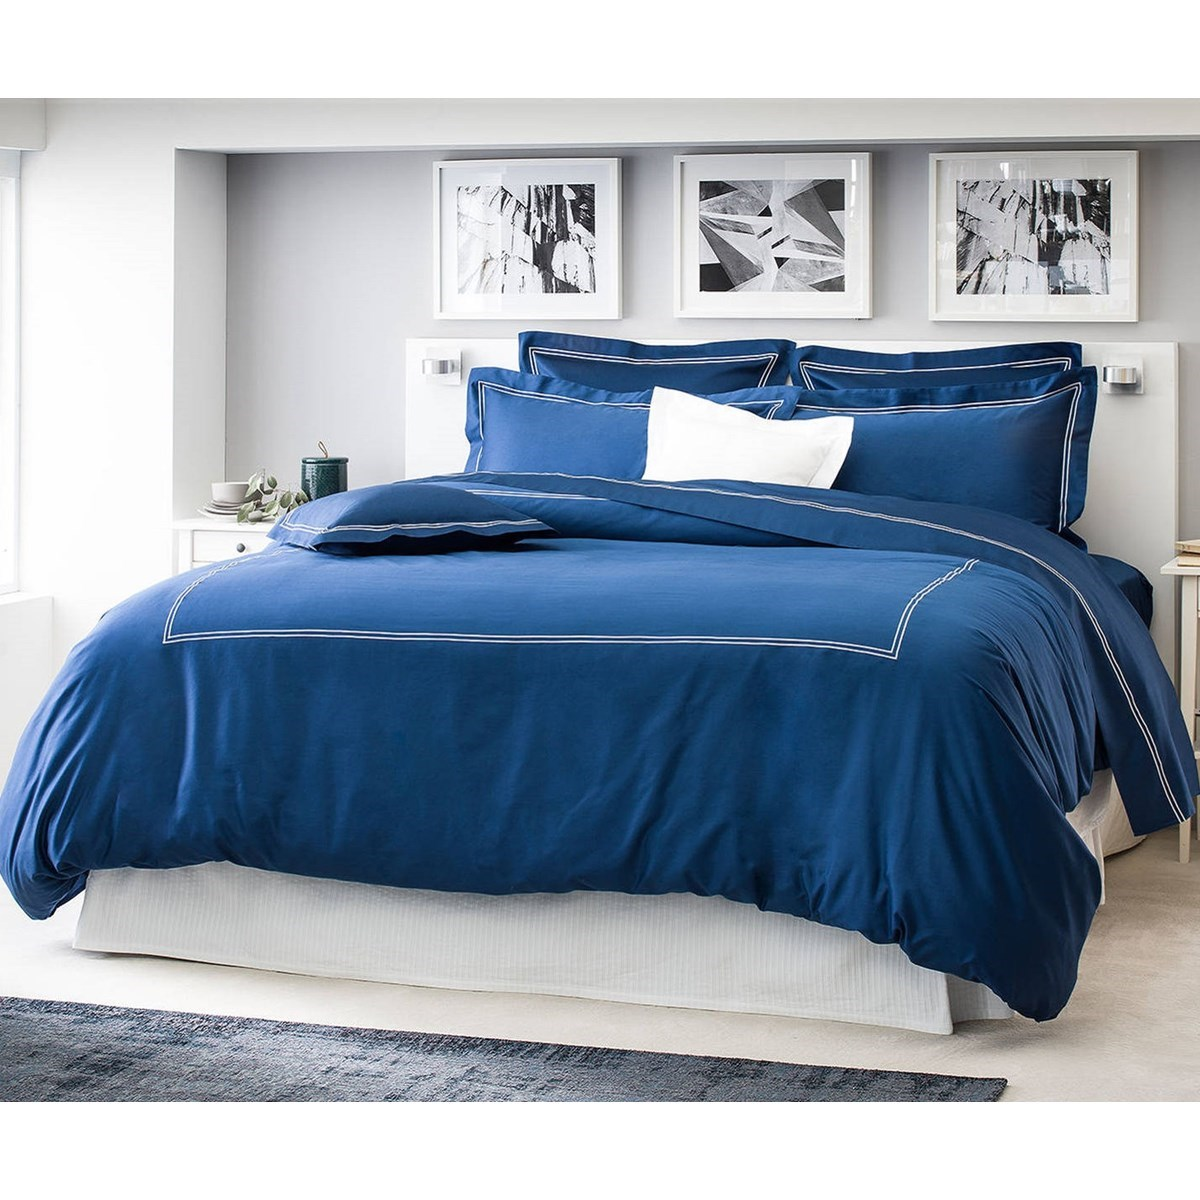 Drap plat luxe en Satin de coton Bleu 300x310 cm